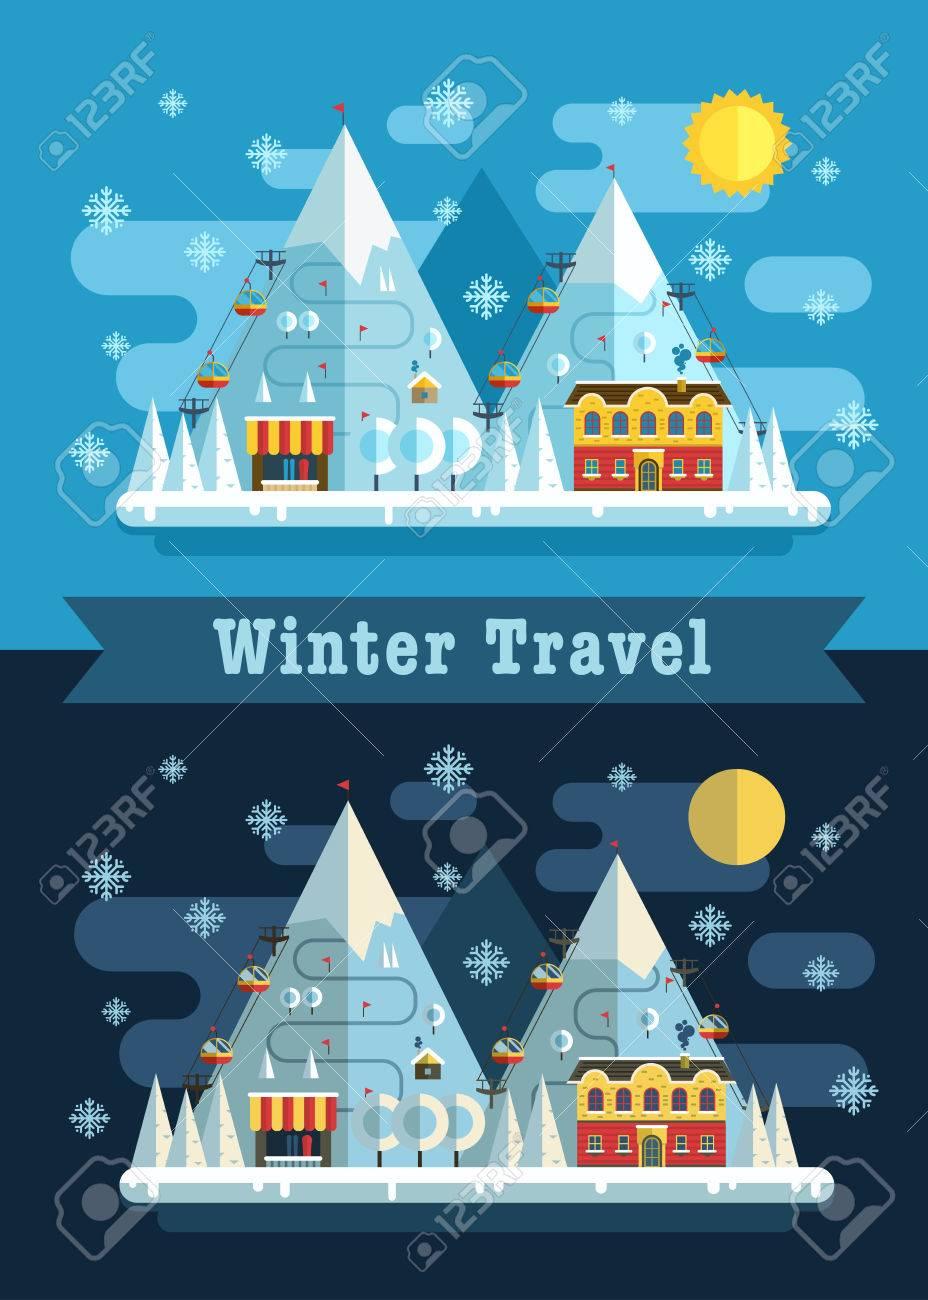 Winter Vacation Flat Landscape Ski Mountain Resort Concept